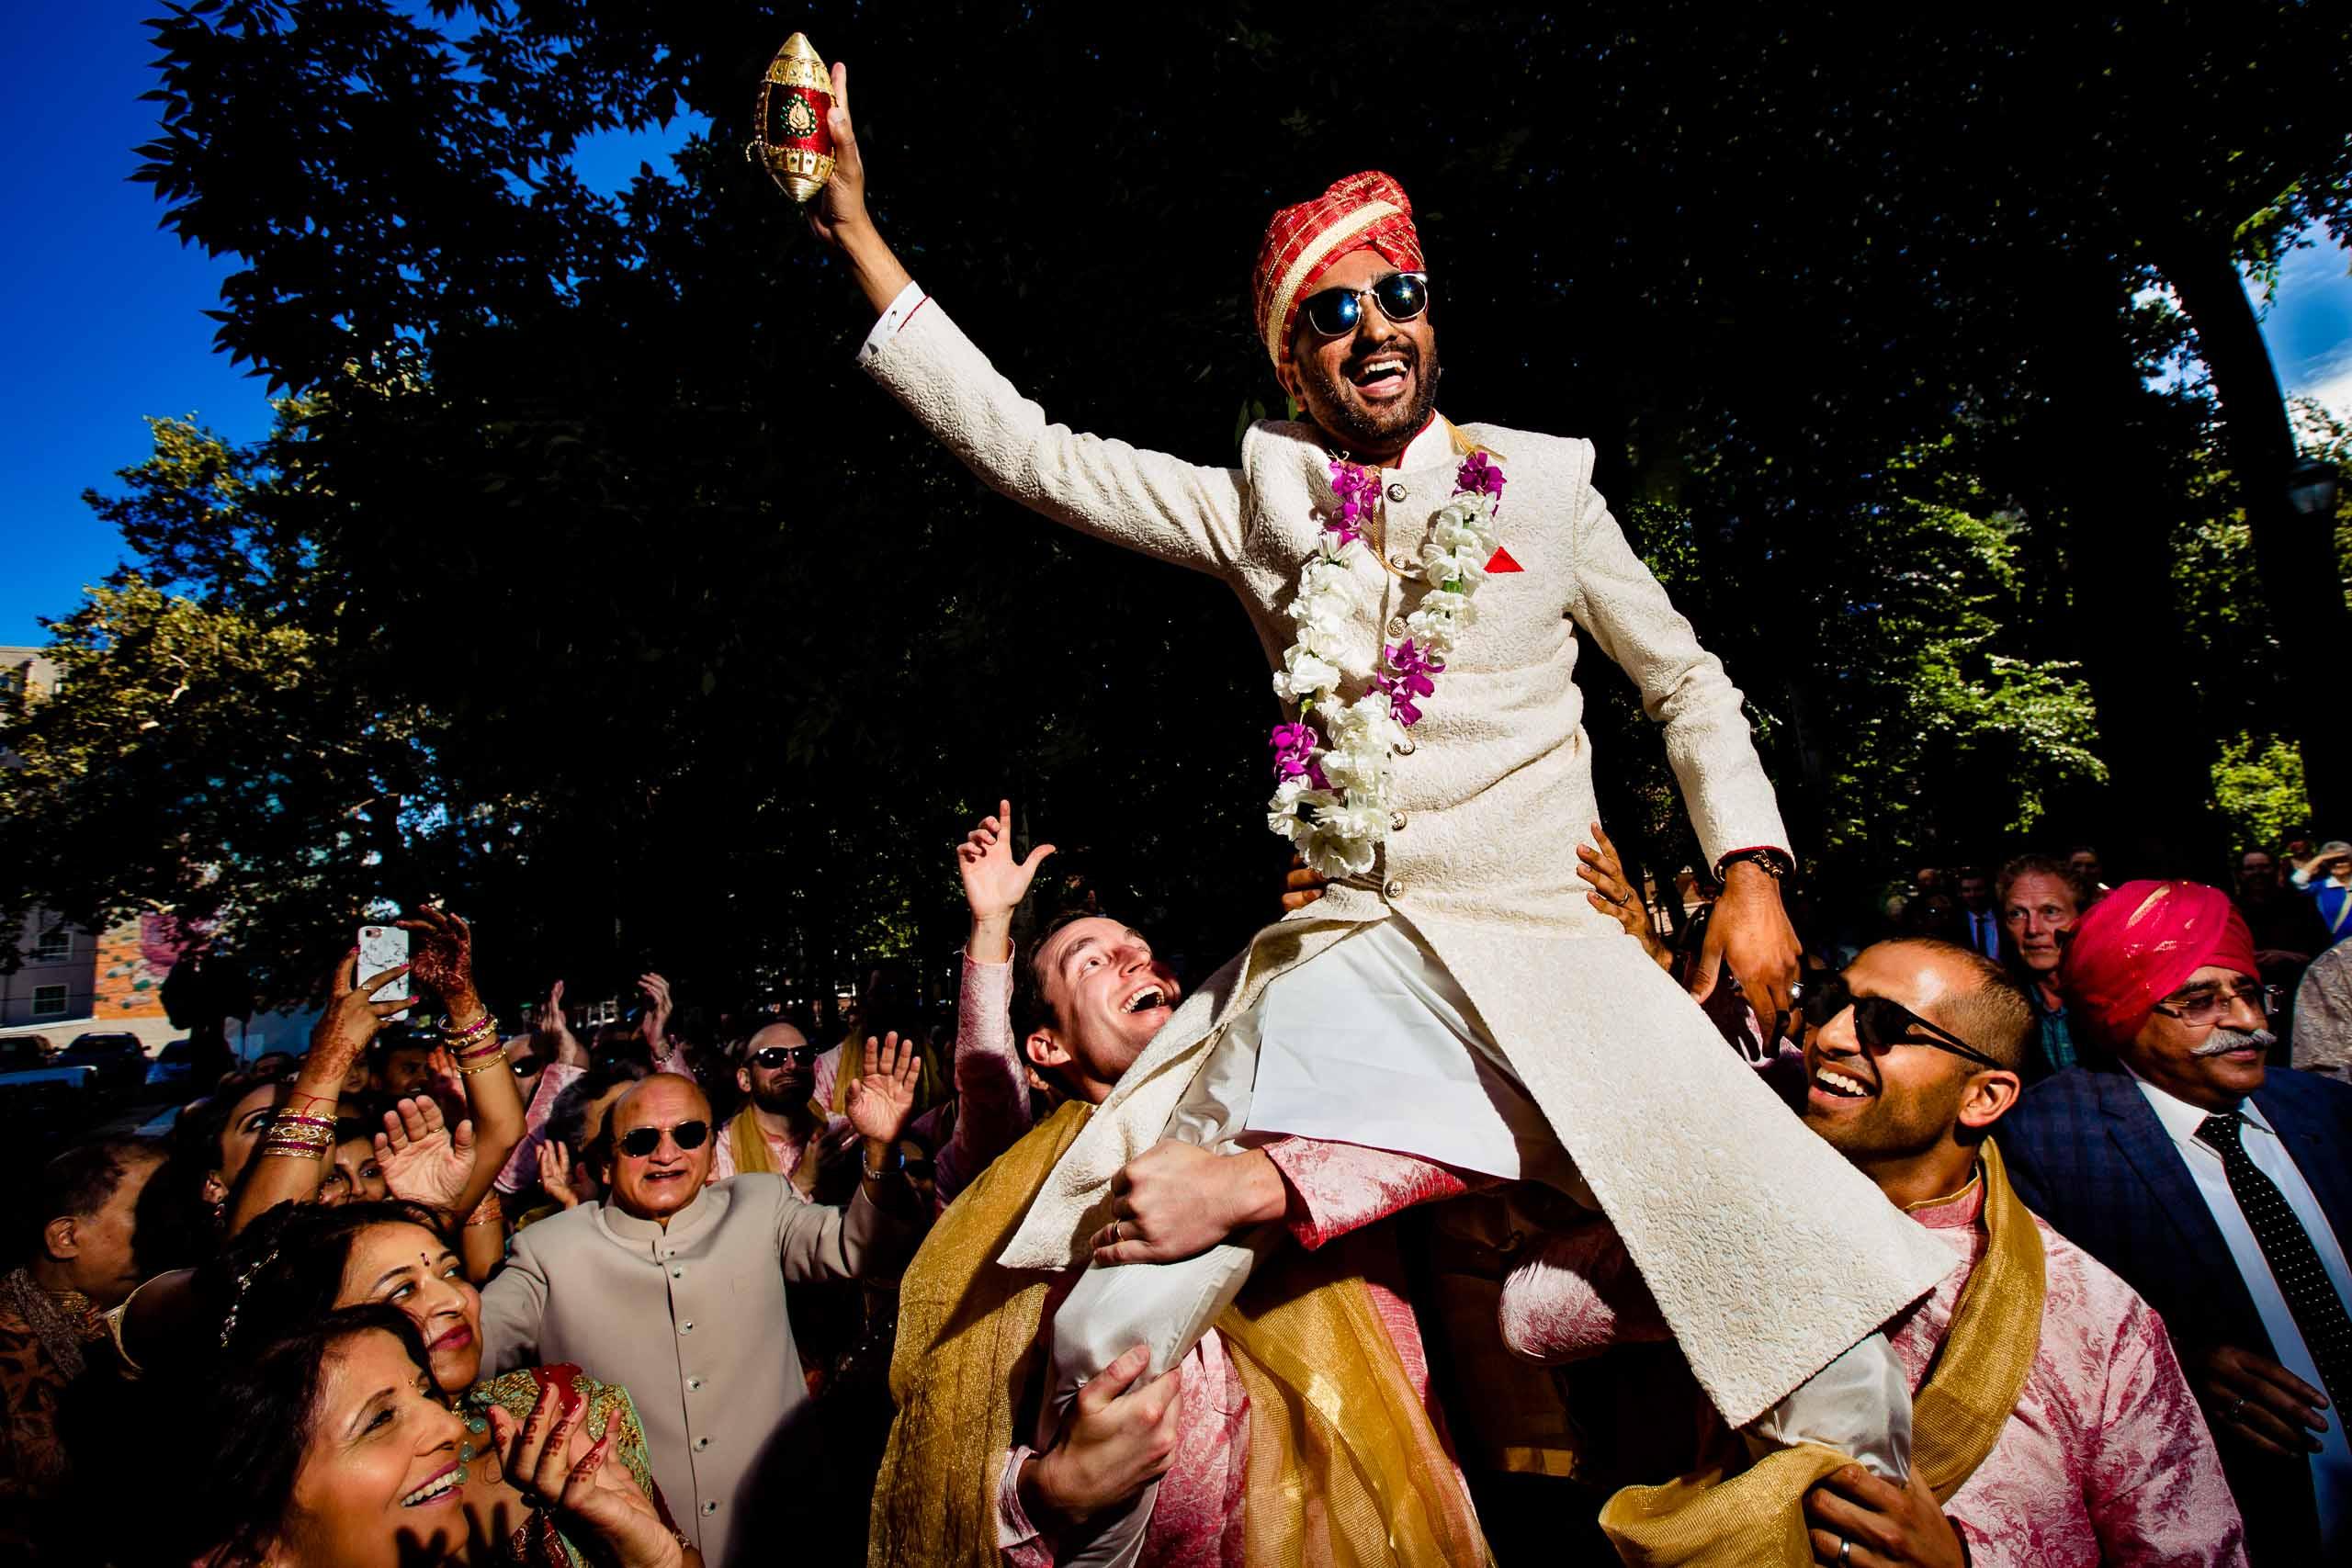 Indian groom riding on groosmens shoulders at a big Indian Portland Art Museum wedding